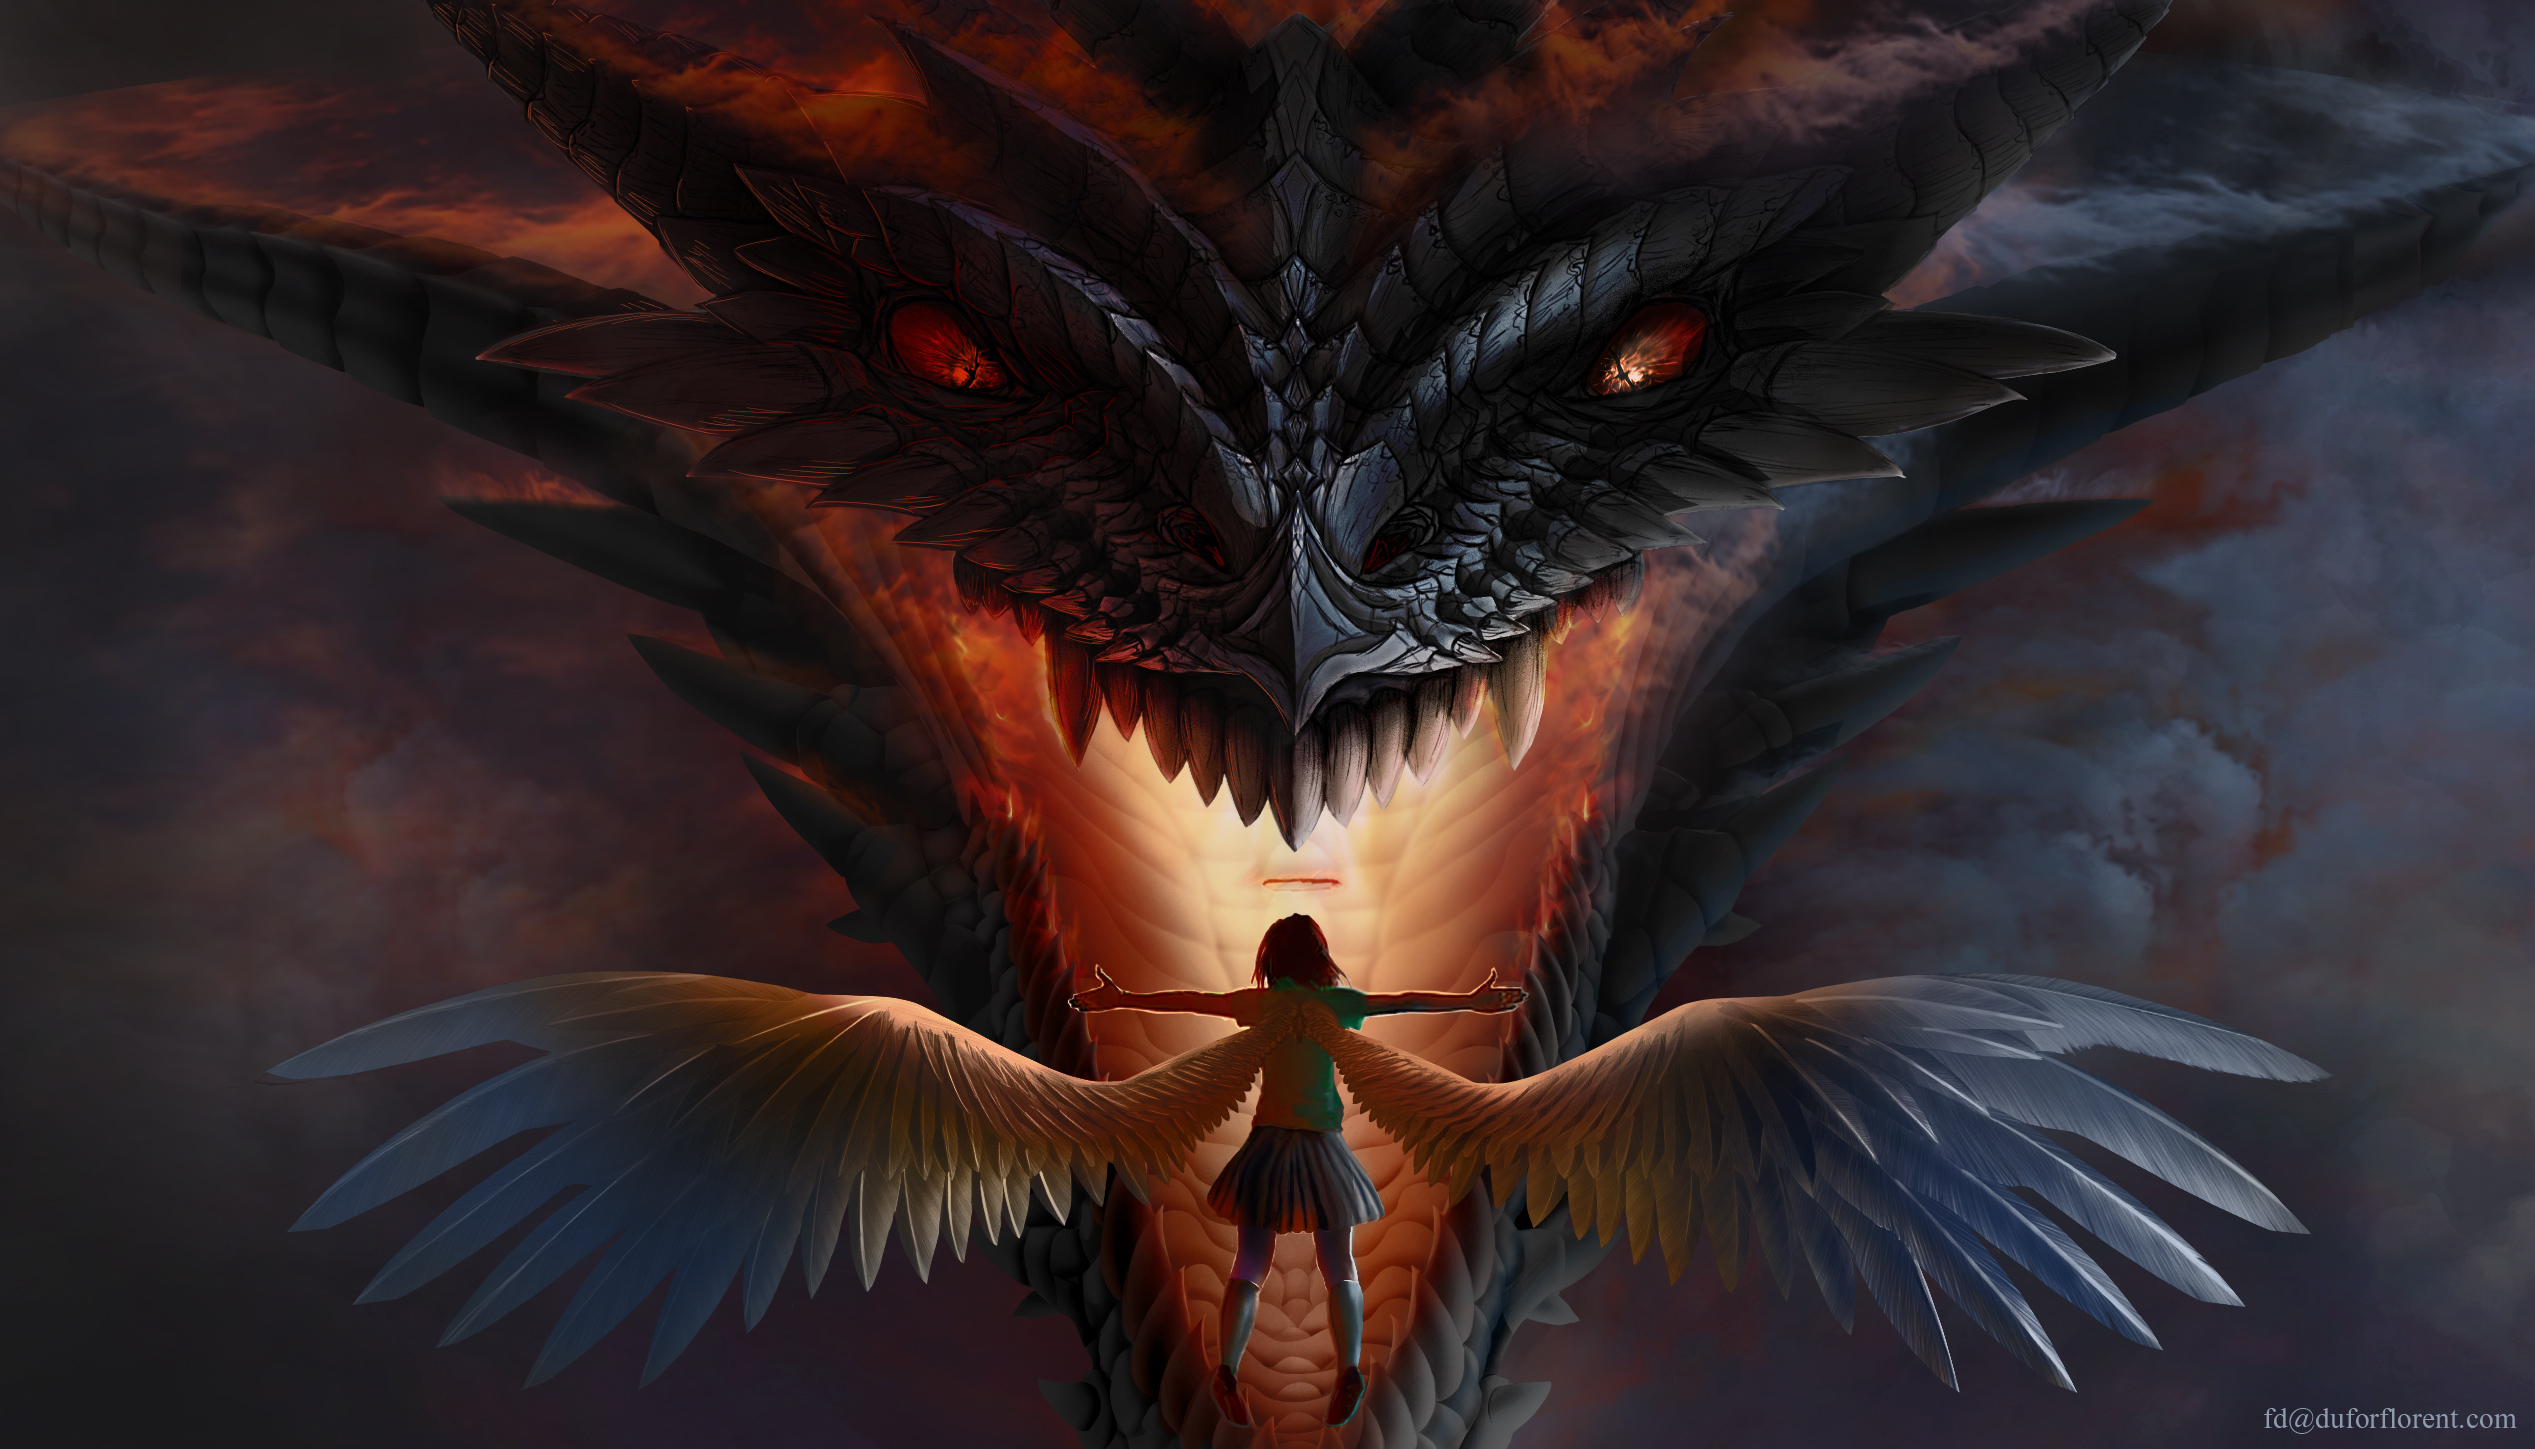 1280x720 dragon vs angel 720p hd 4k wallpapers images - Fantasy wallpaper 720p ...